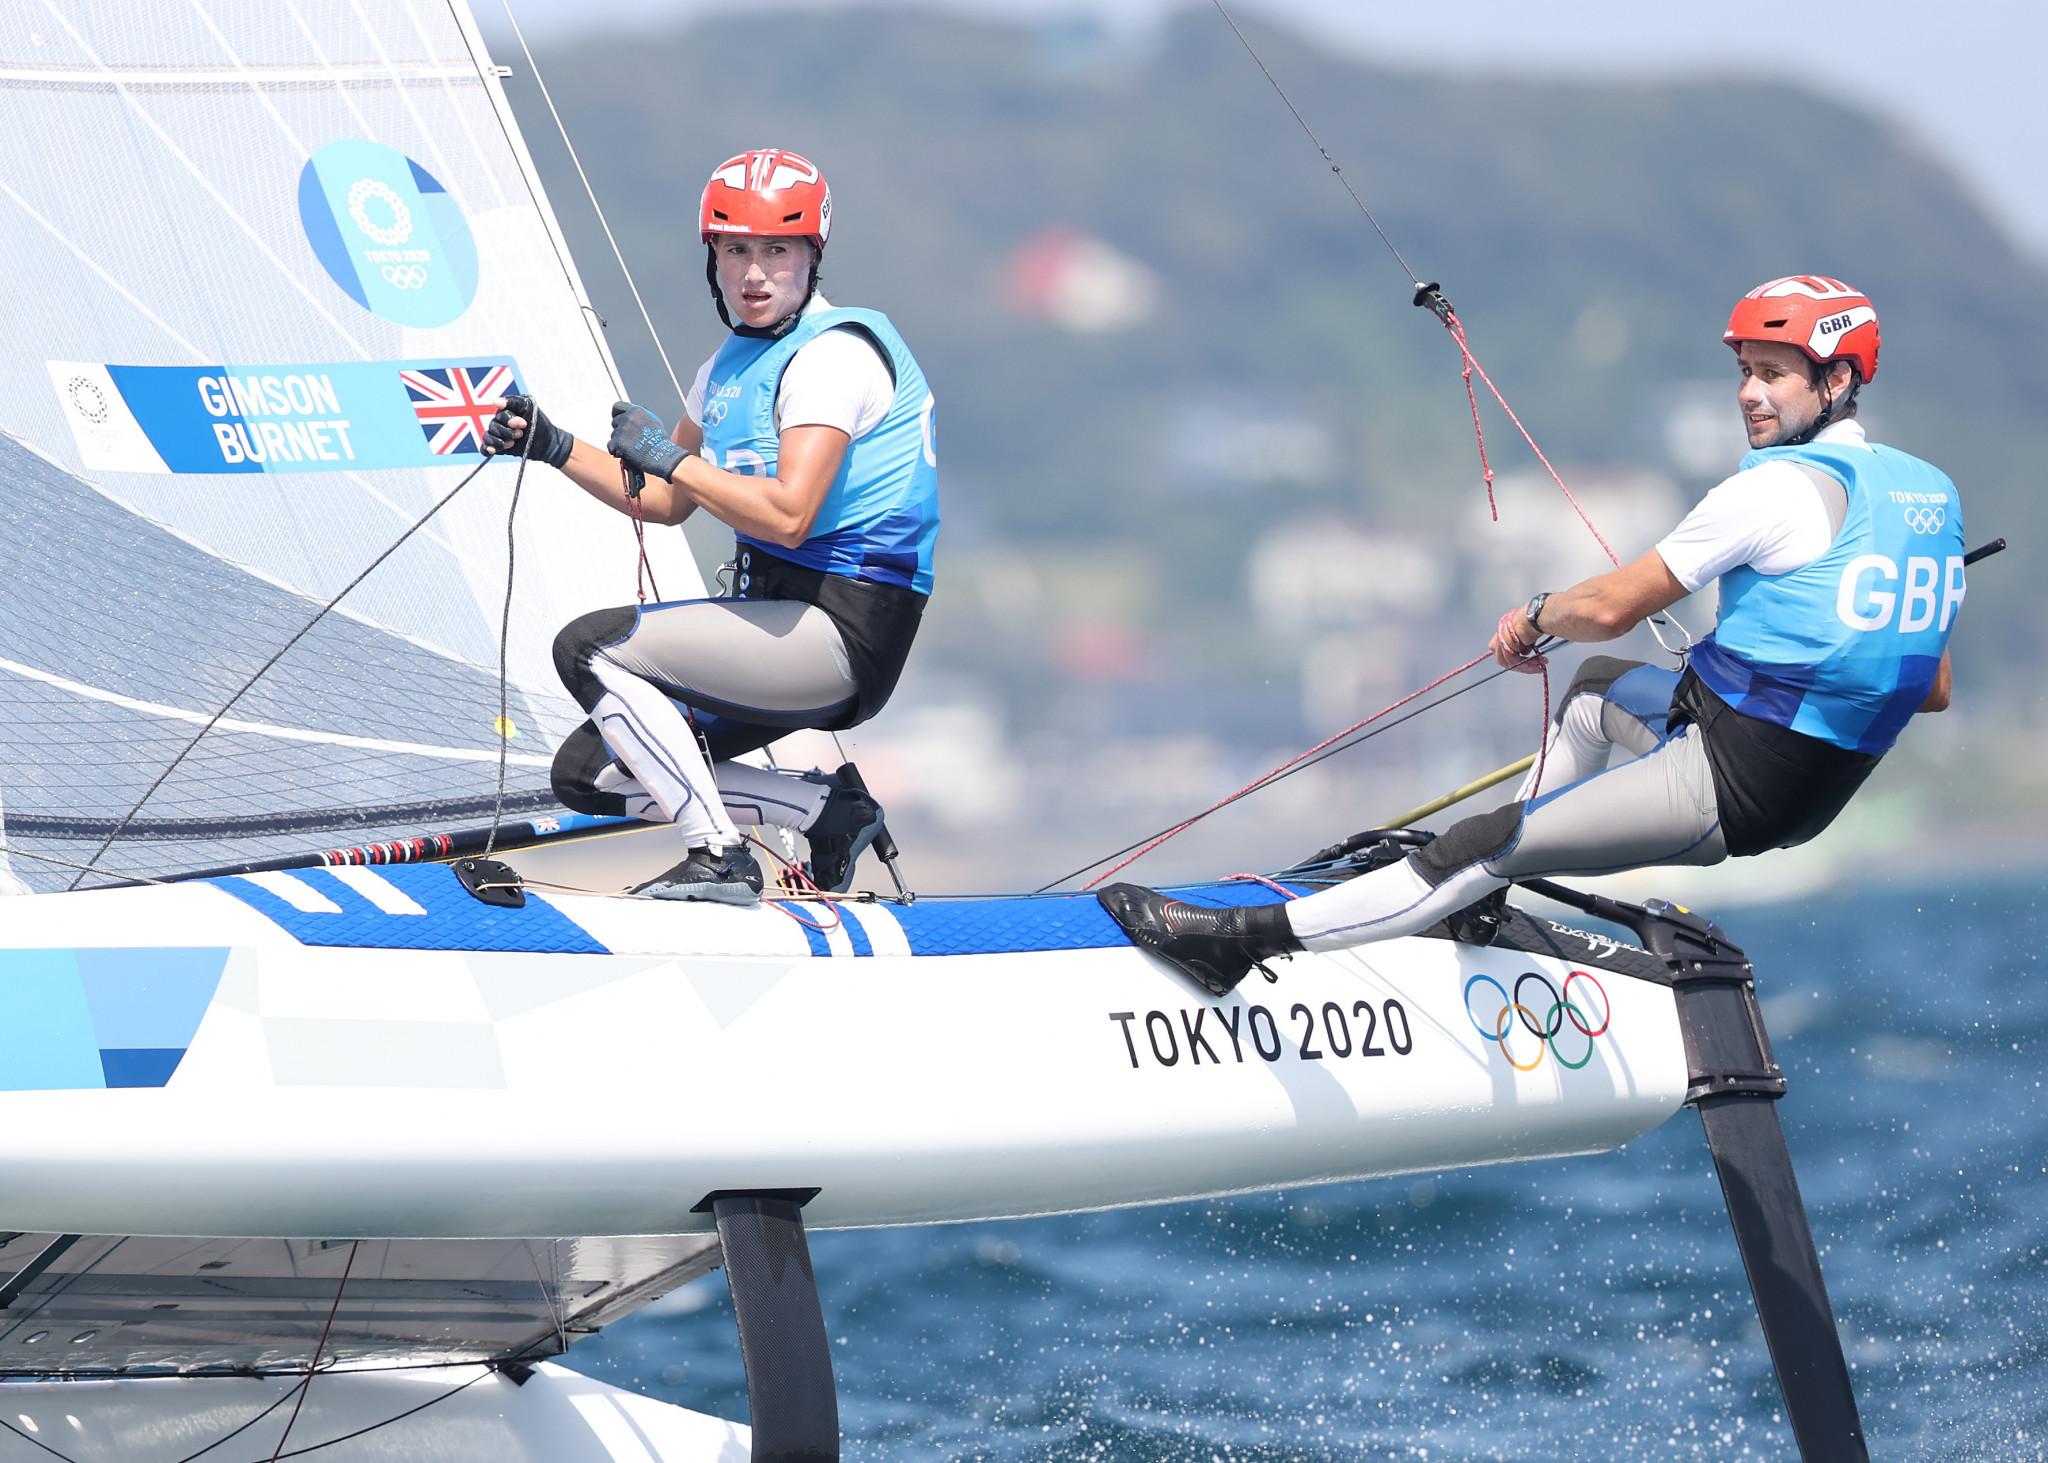 Gimson and Burnet keep Nacra 17 lead entering final day of European Championship